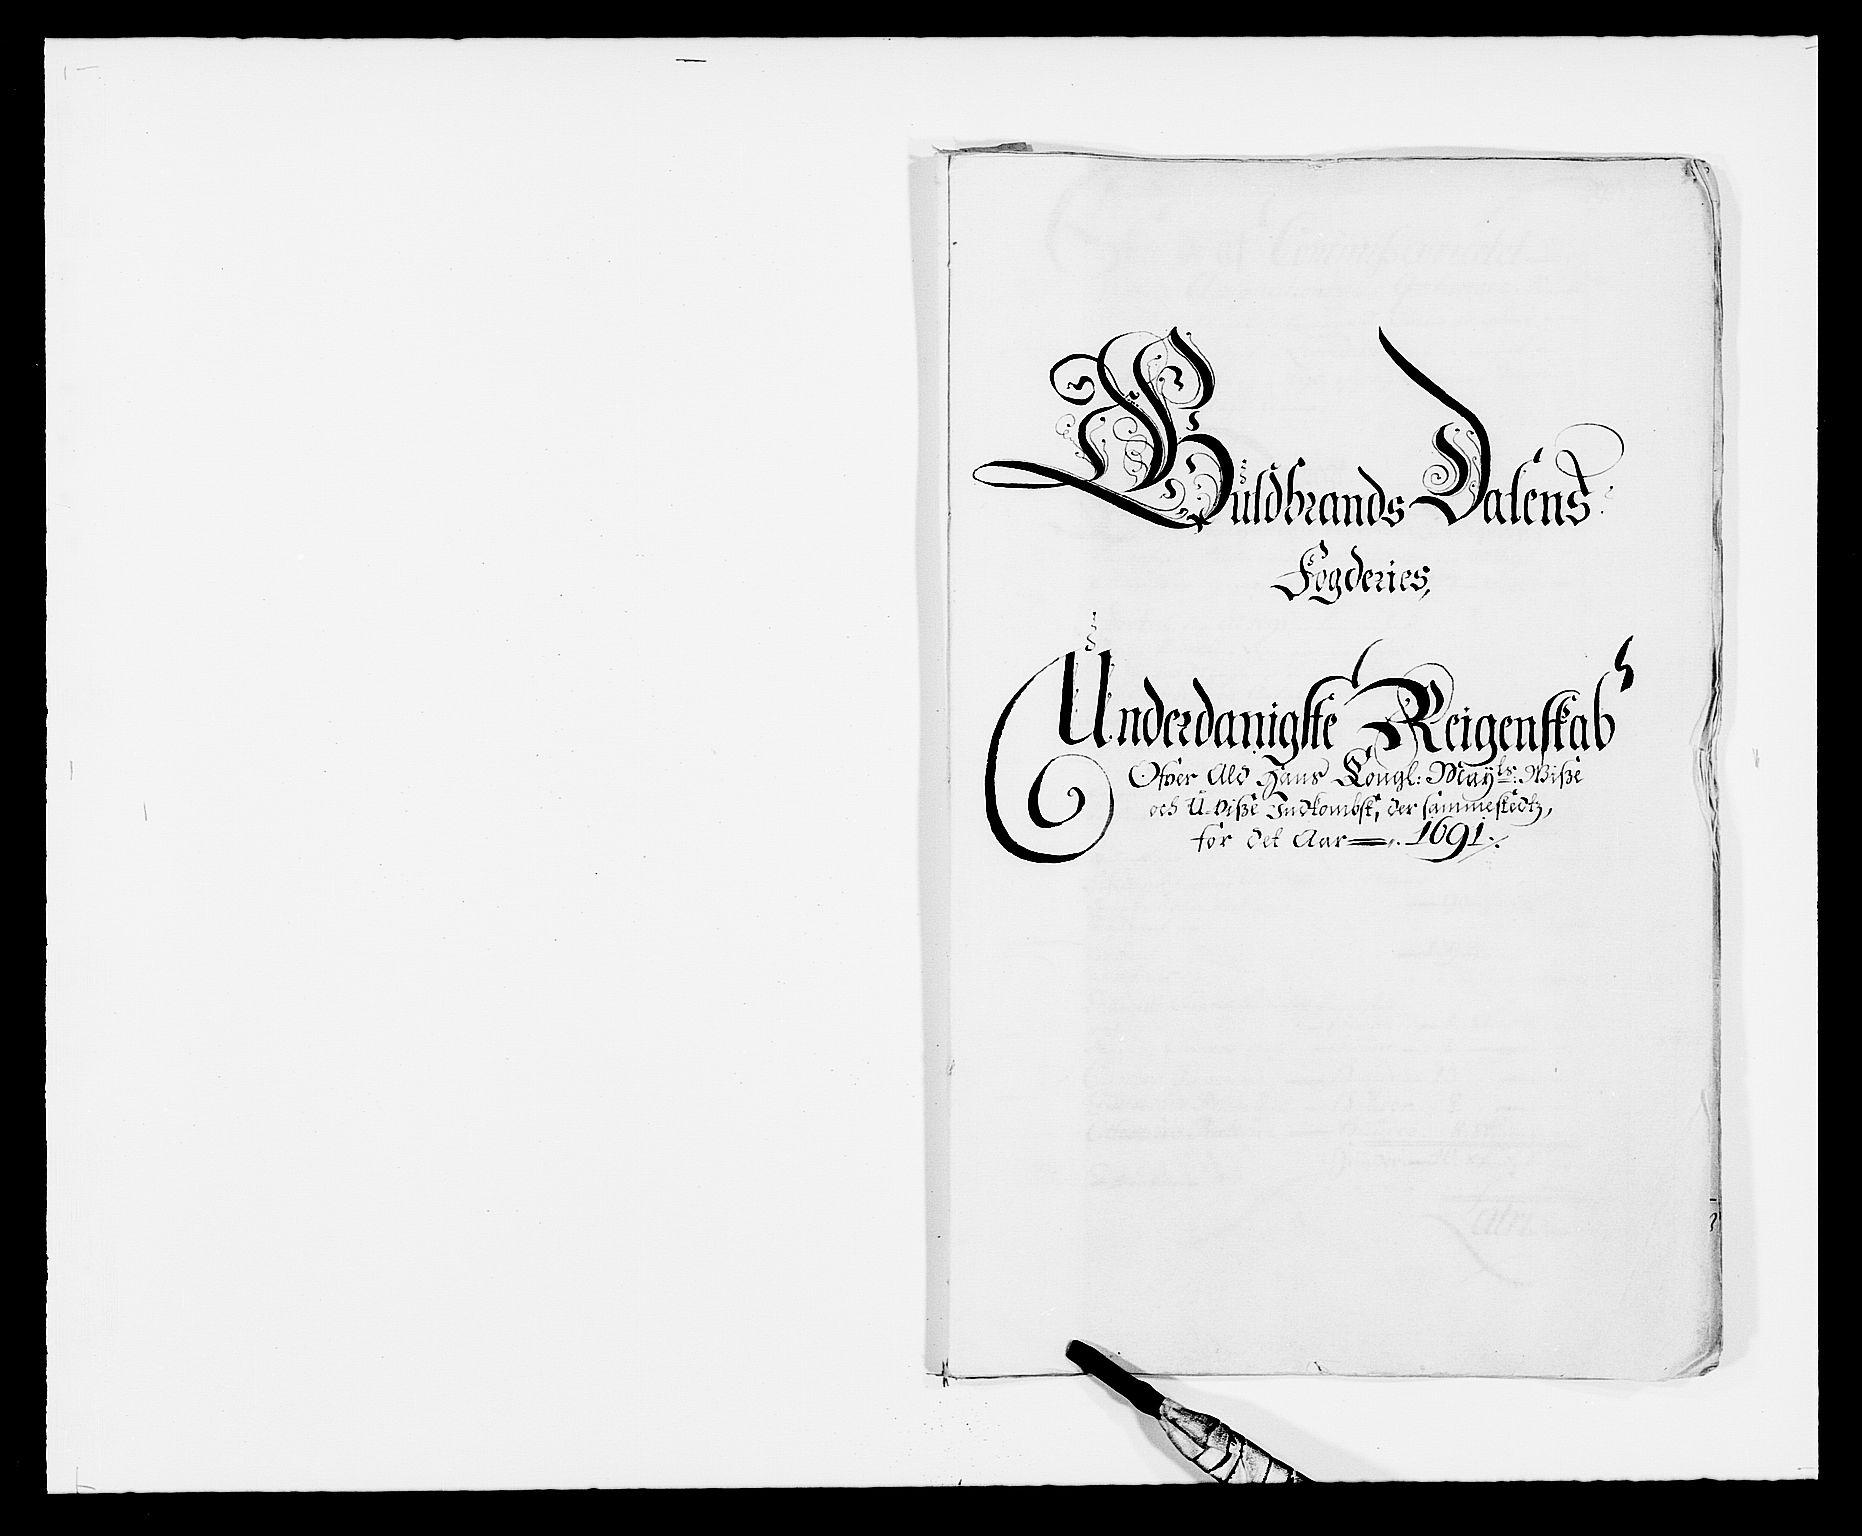 RA, Rentekammeret inntil 1814, Reviderte regnskaper, Fogderegnskap, R17/L1165: Fogderegnskap Gudbrandsdal, 1690-1692, s. 196